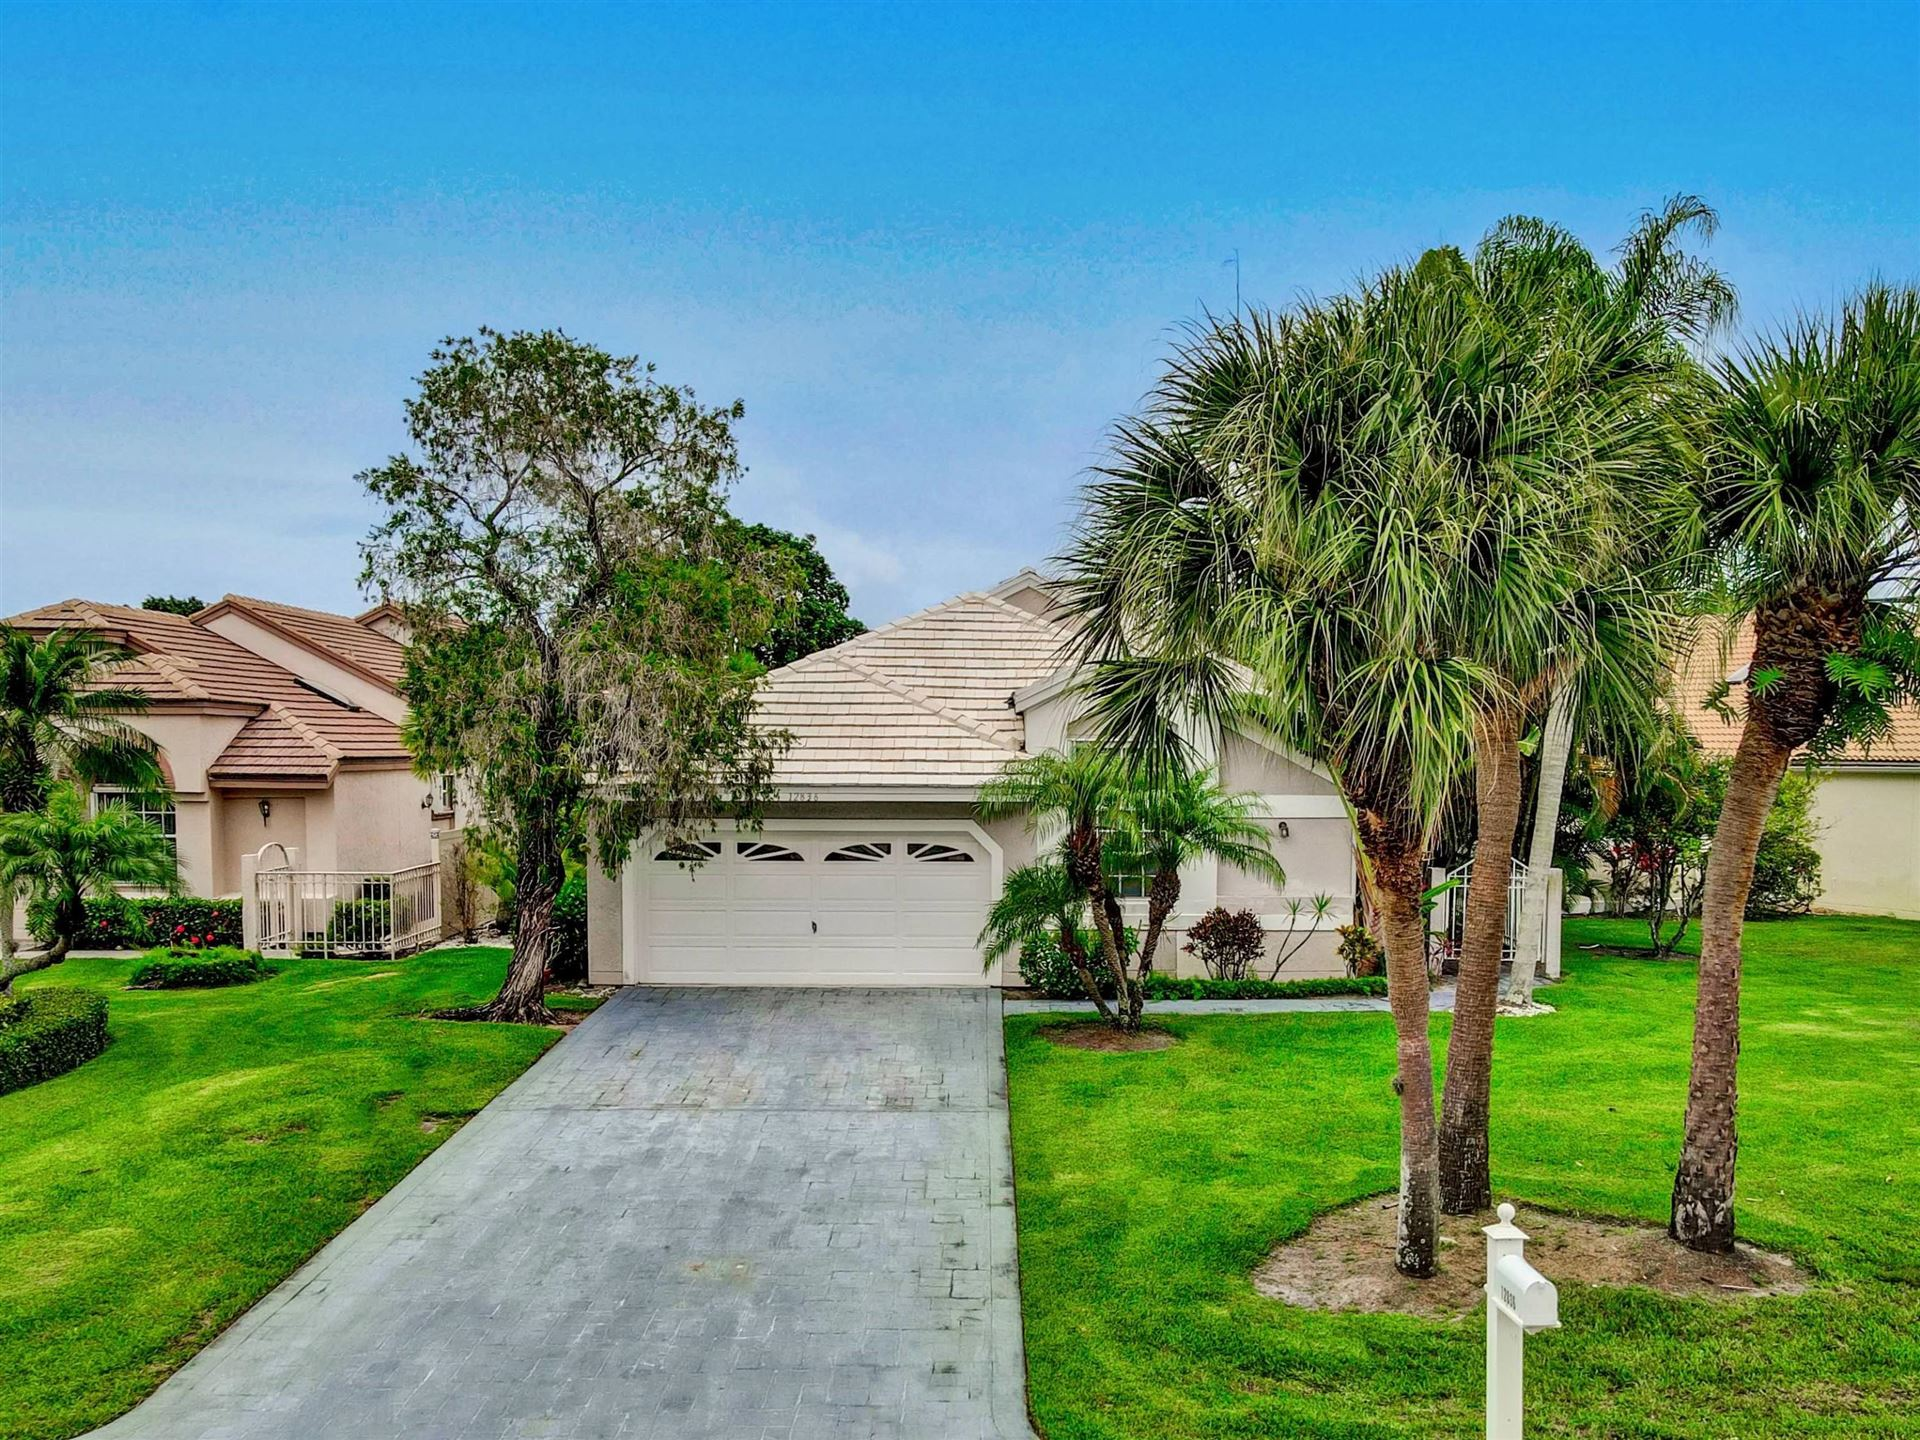 12836 Touchstone Place, Palm Beach Gardens, FL 33418 - MLS#: RX-10727516